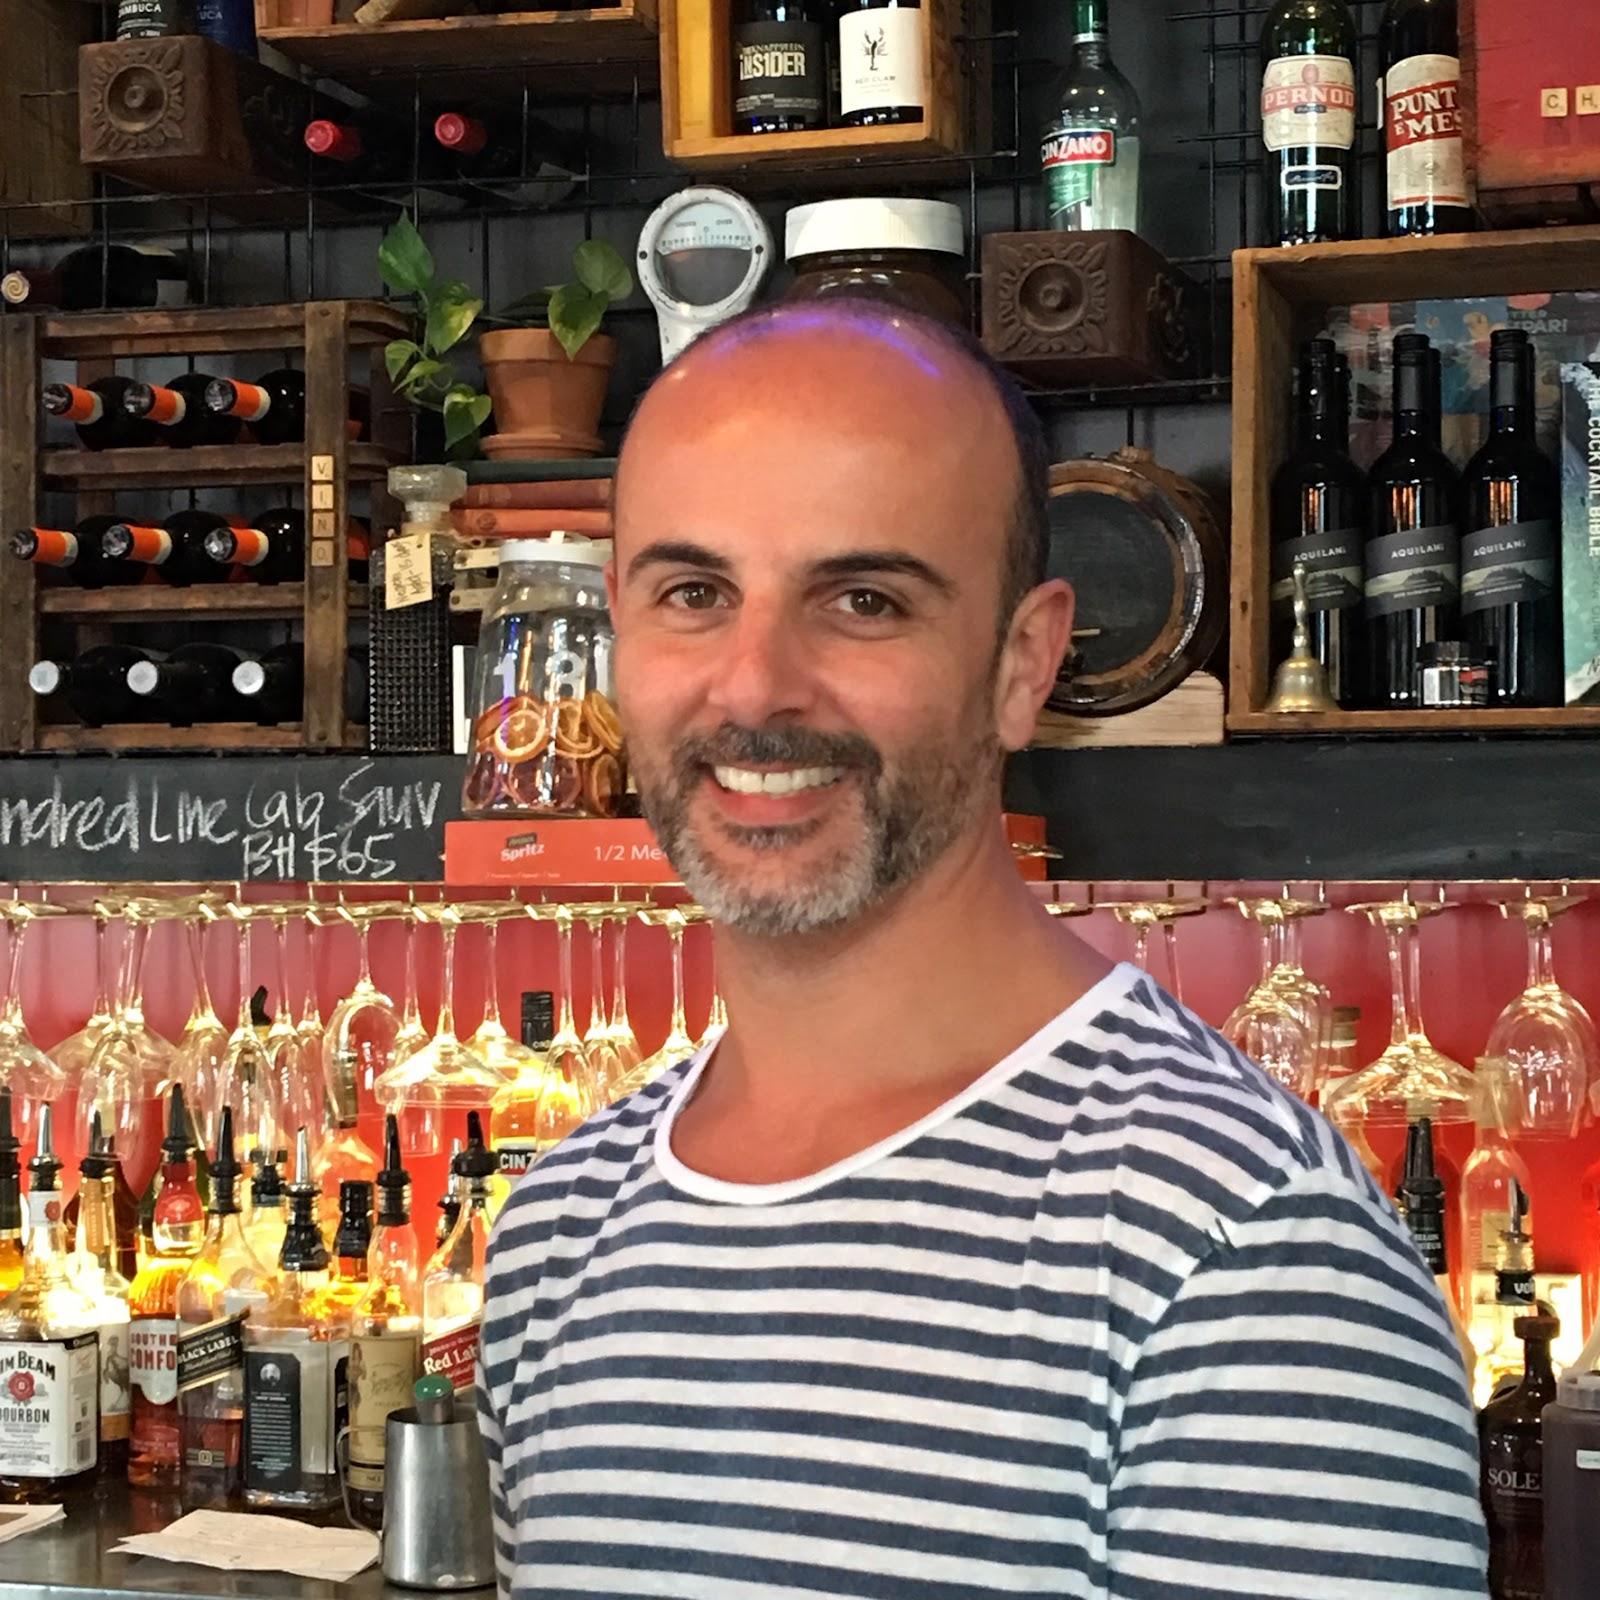 Baritalia Restaurant owner Simon Vella